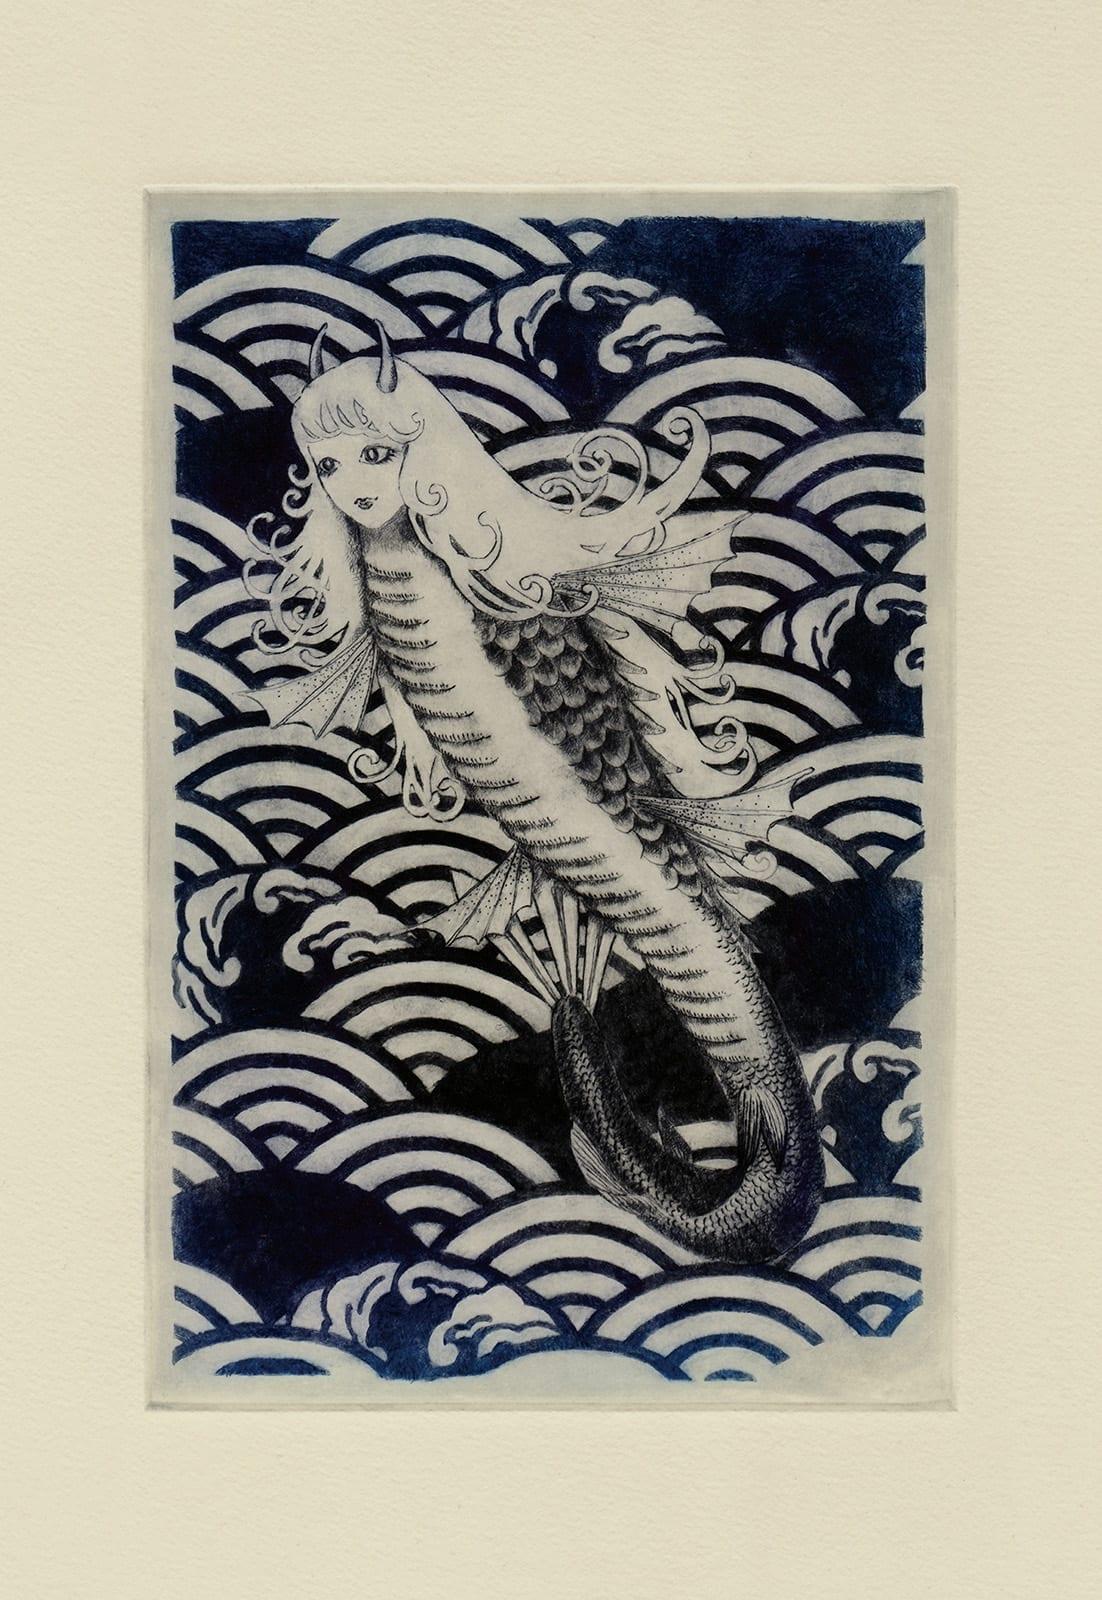 Jinja-hime (drypoint etching by Yaemi Shigyo)